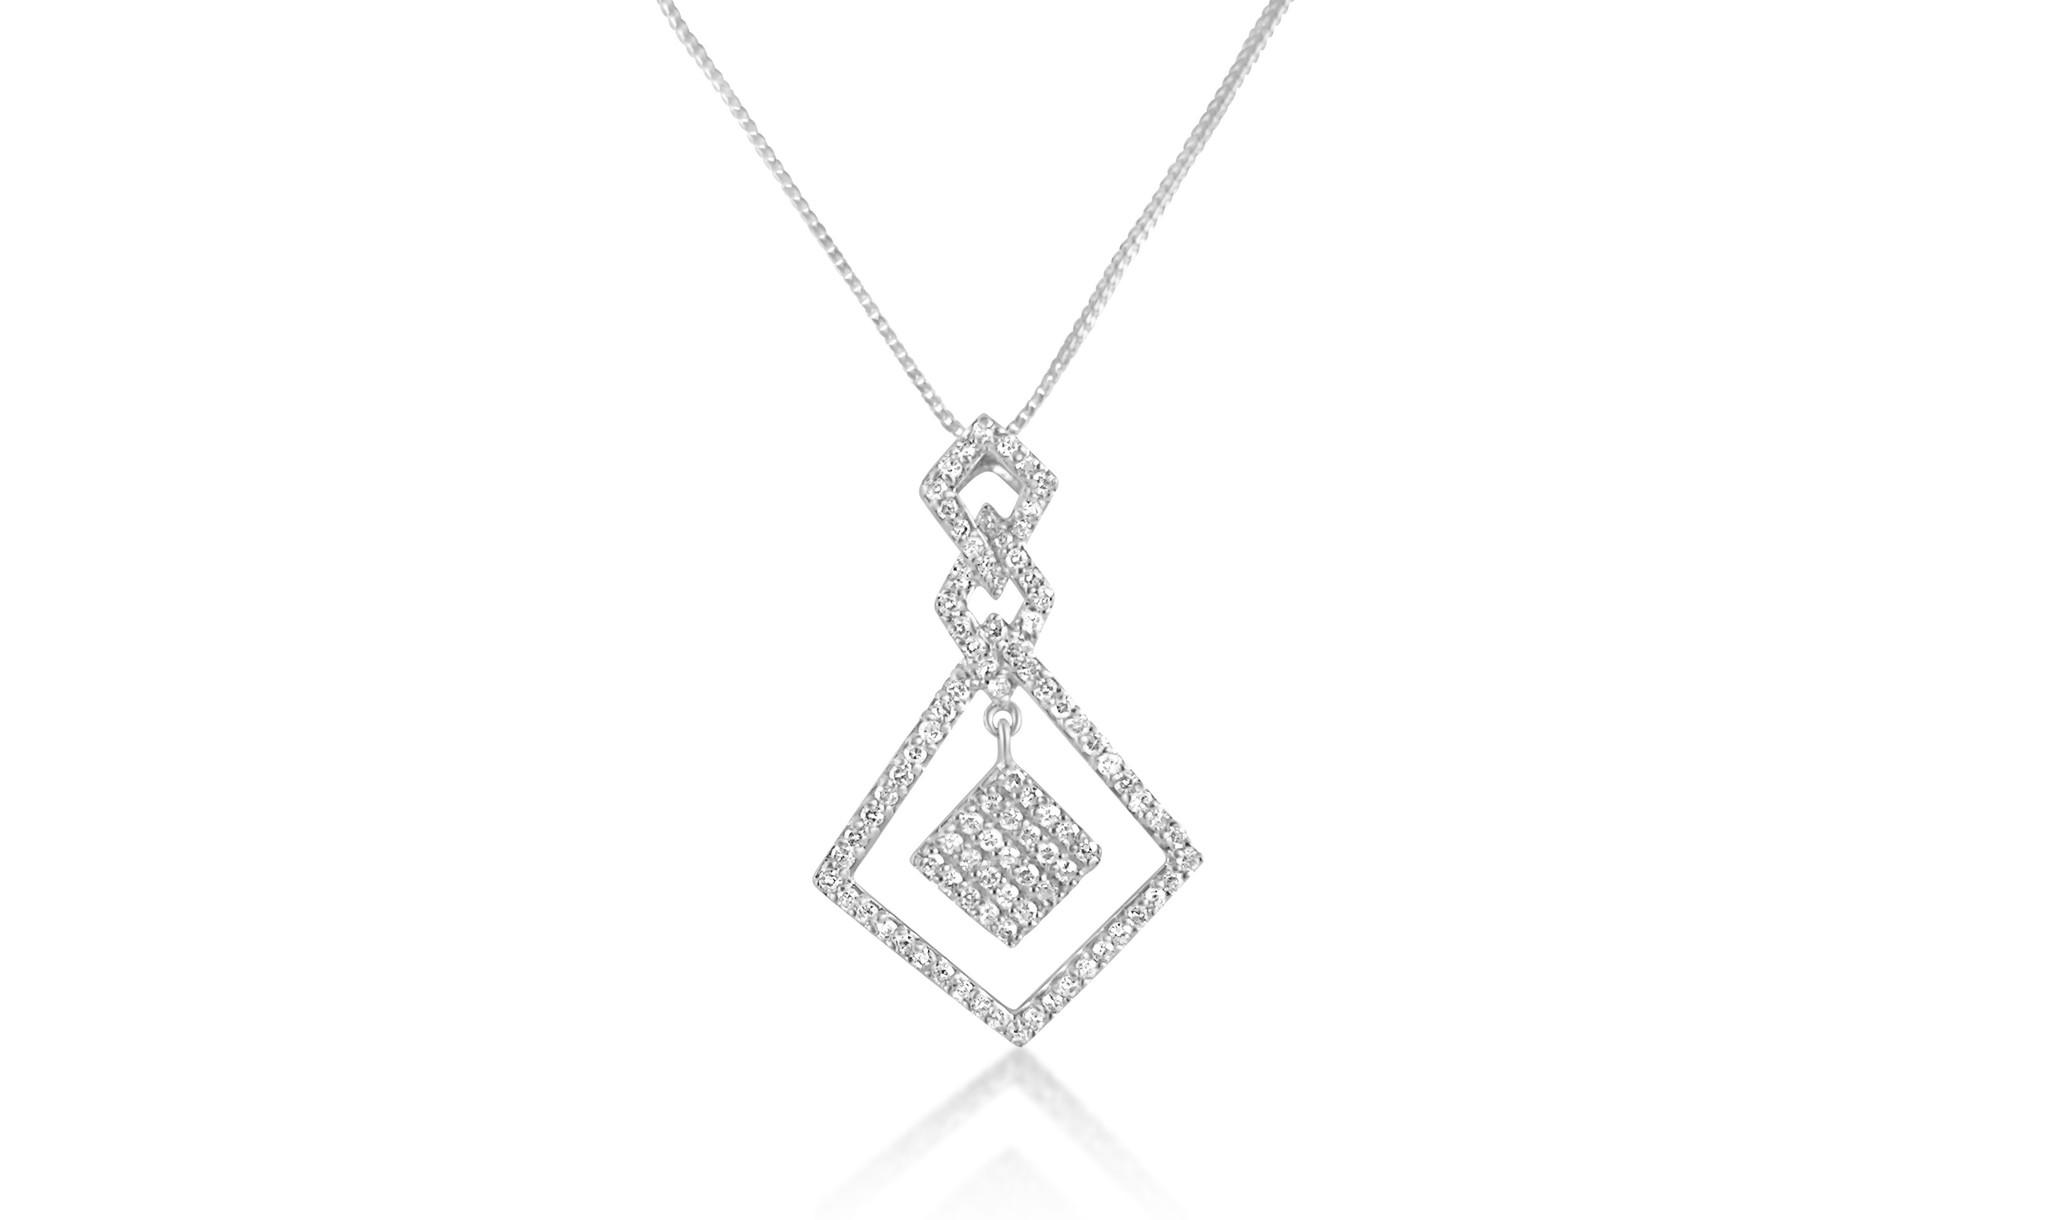 18 karat white gold pendant with 0.65 ct diamonds